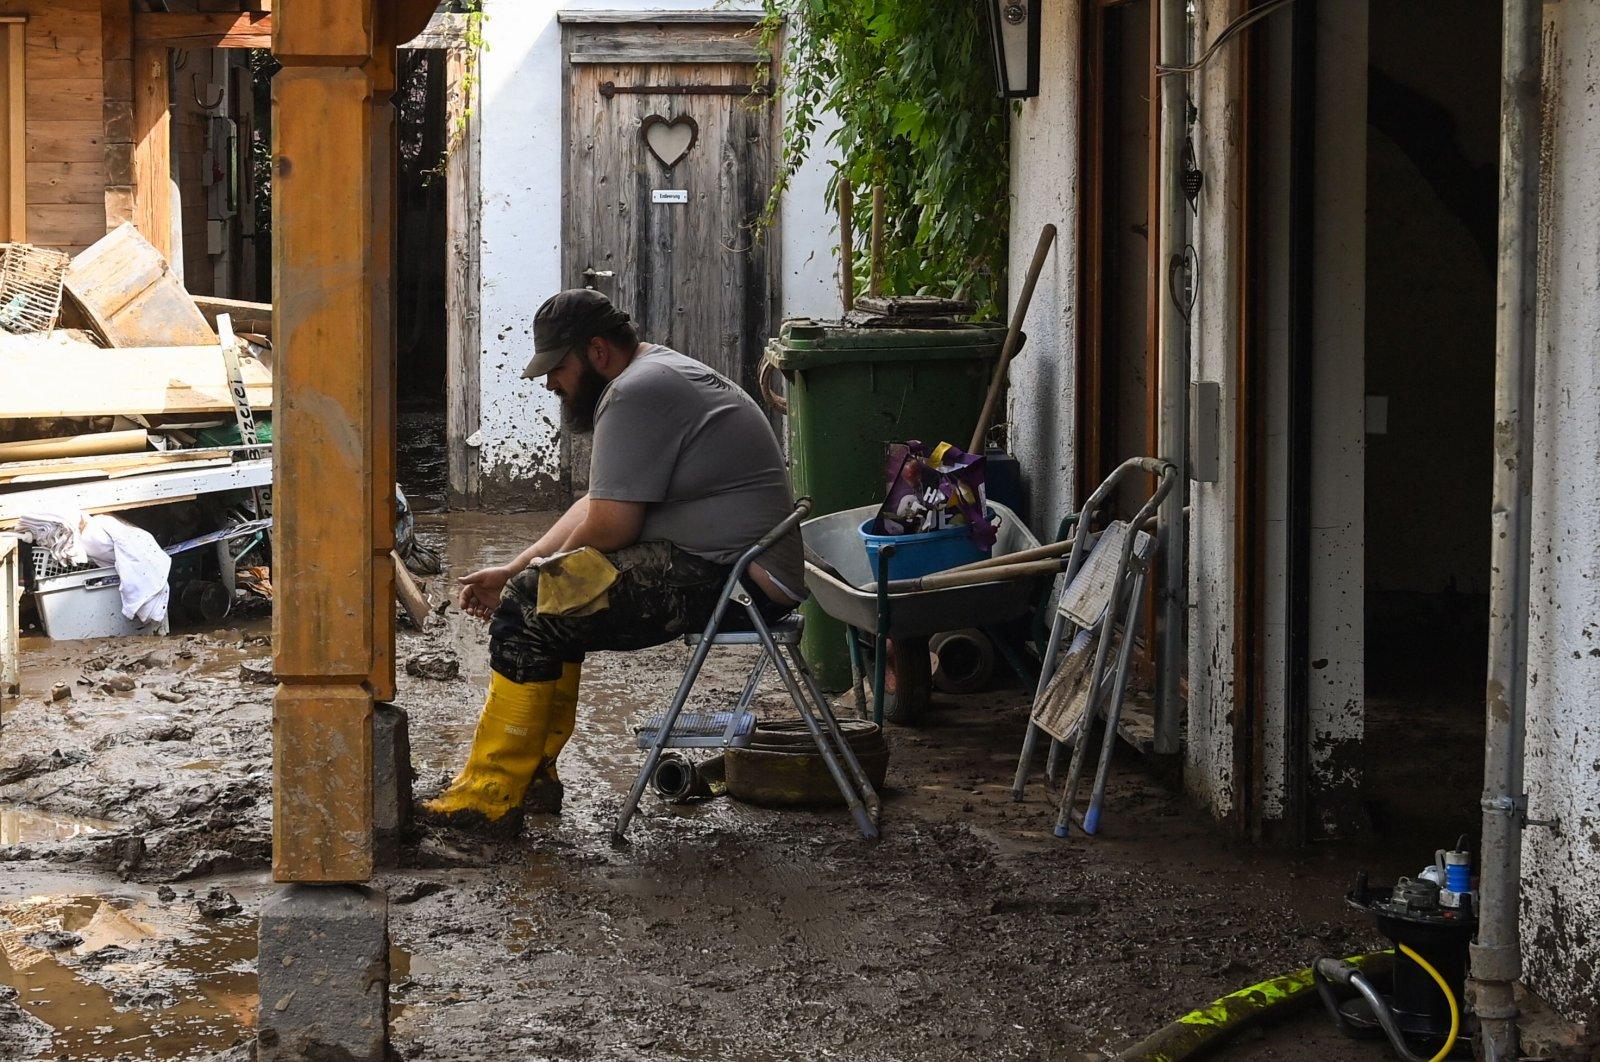 A man rests in a muddied courtyard in Insul near Bad Neuenahr-Ahrweiler, western Germany, on July 17, 2021. (AFP Photo)